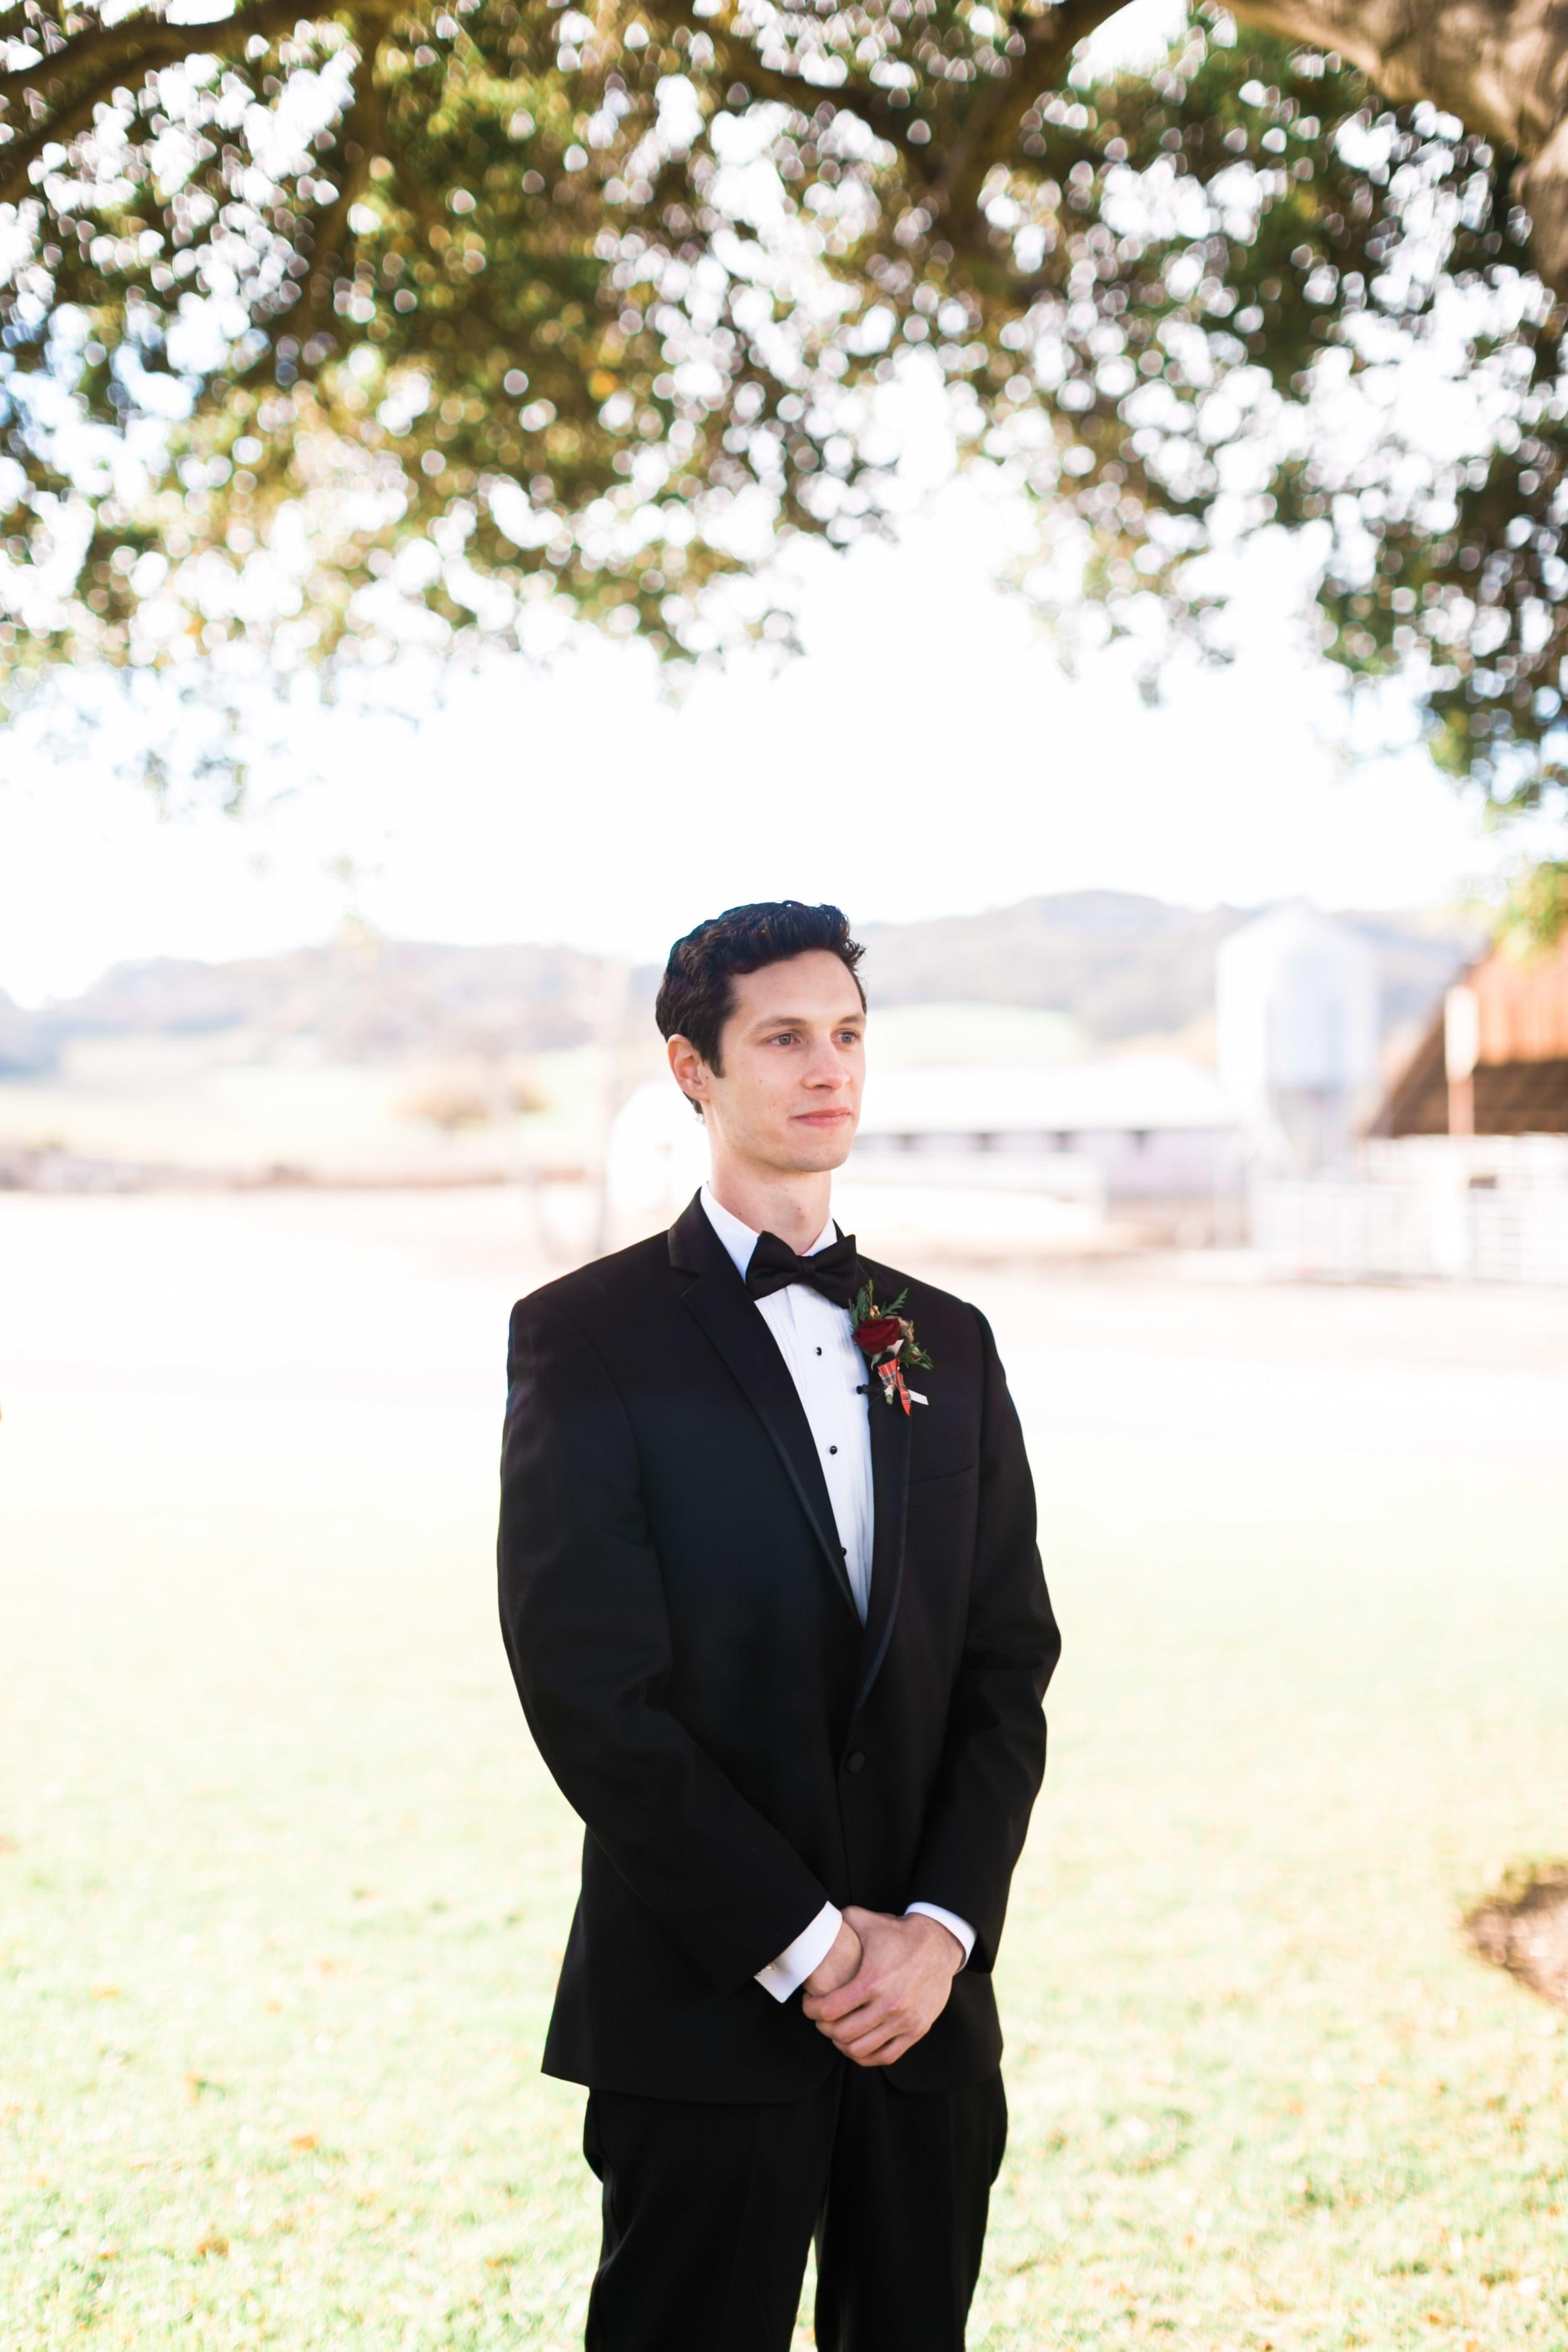 Natalie_Schutt_Photography_Winter_Wedding_San_Luis_Obispo-104.jpg